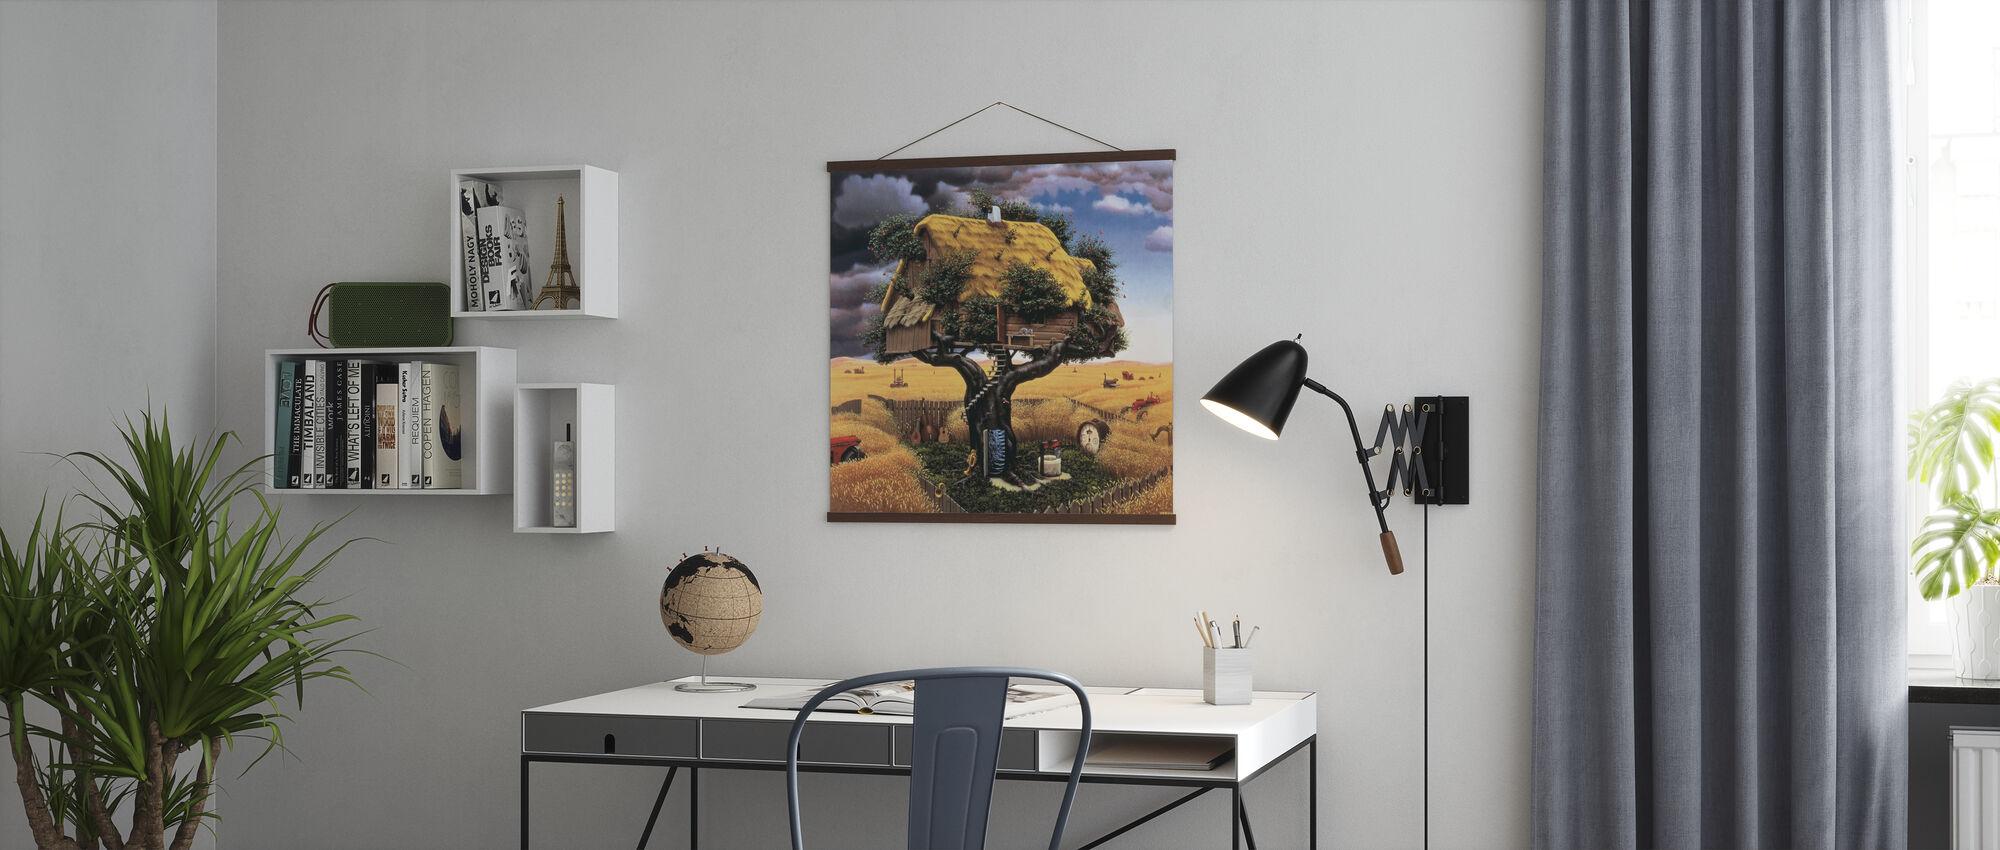 Amok Ernte - Poster - Büro